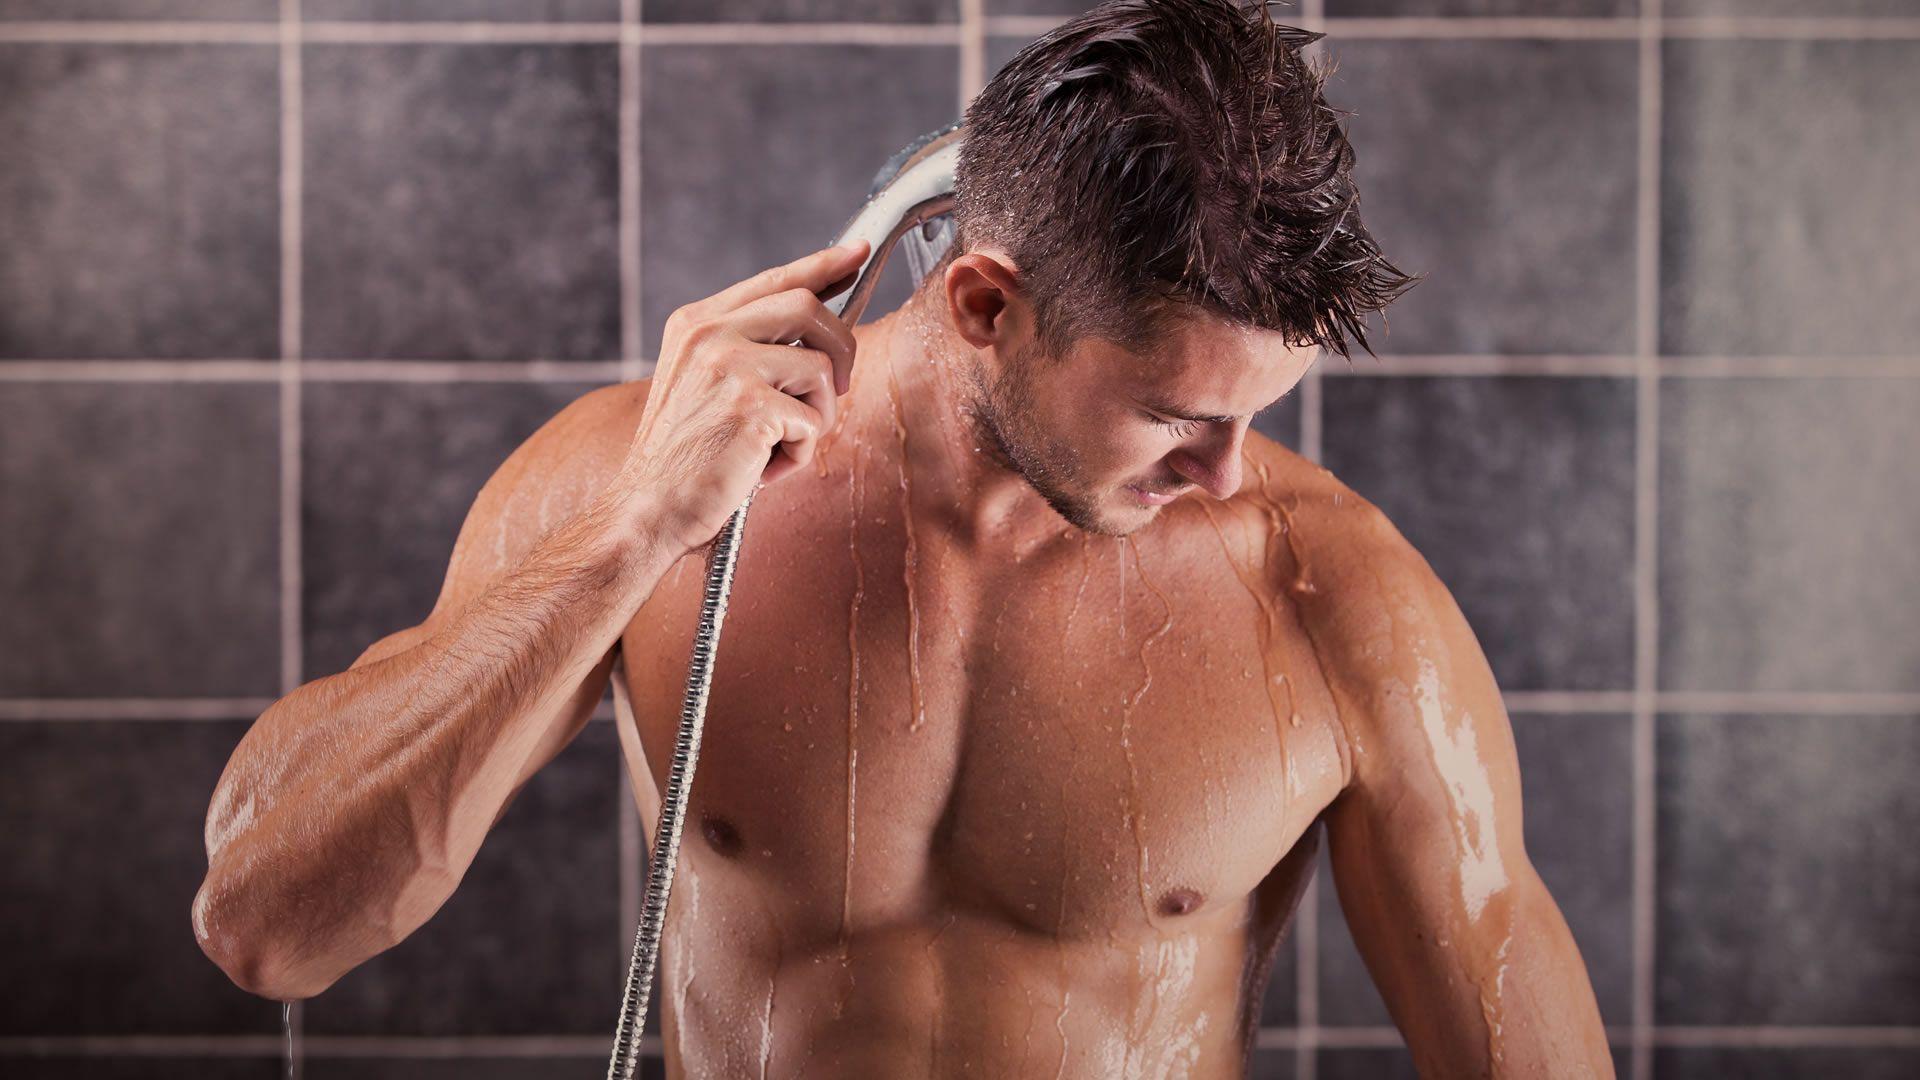 Shower Desktop Wallpaper